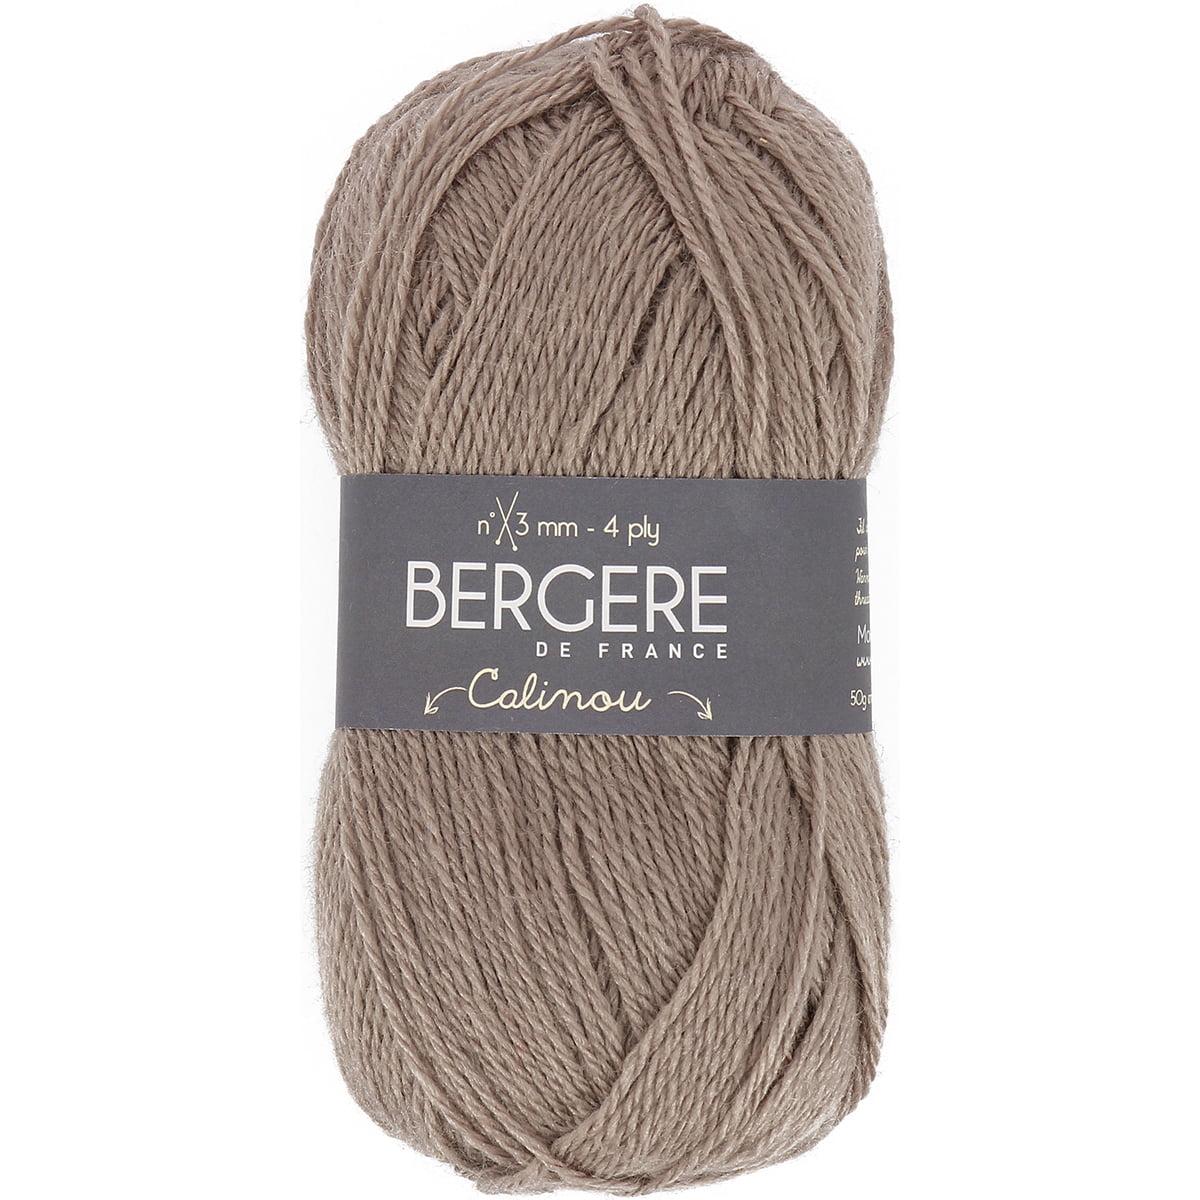 Bergere De France Calinou Yarn-Ourson